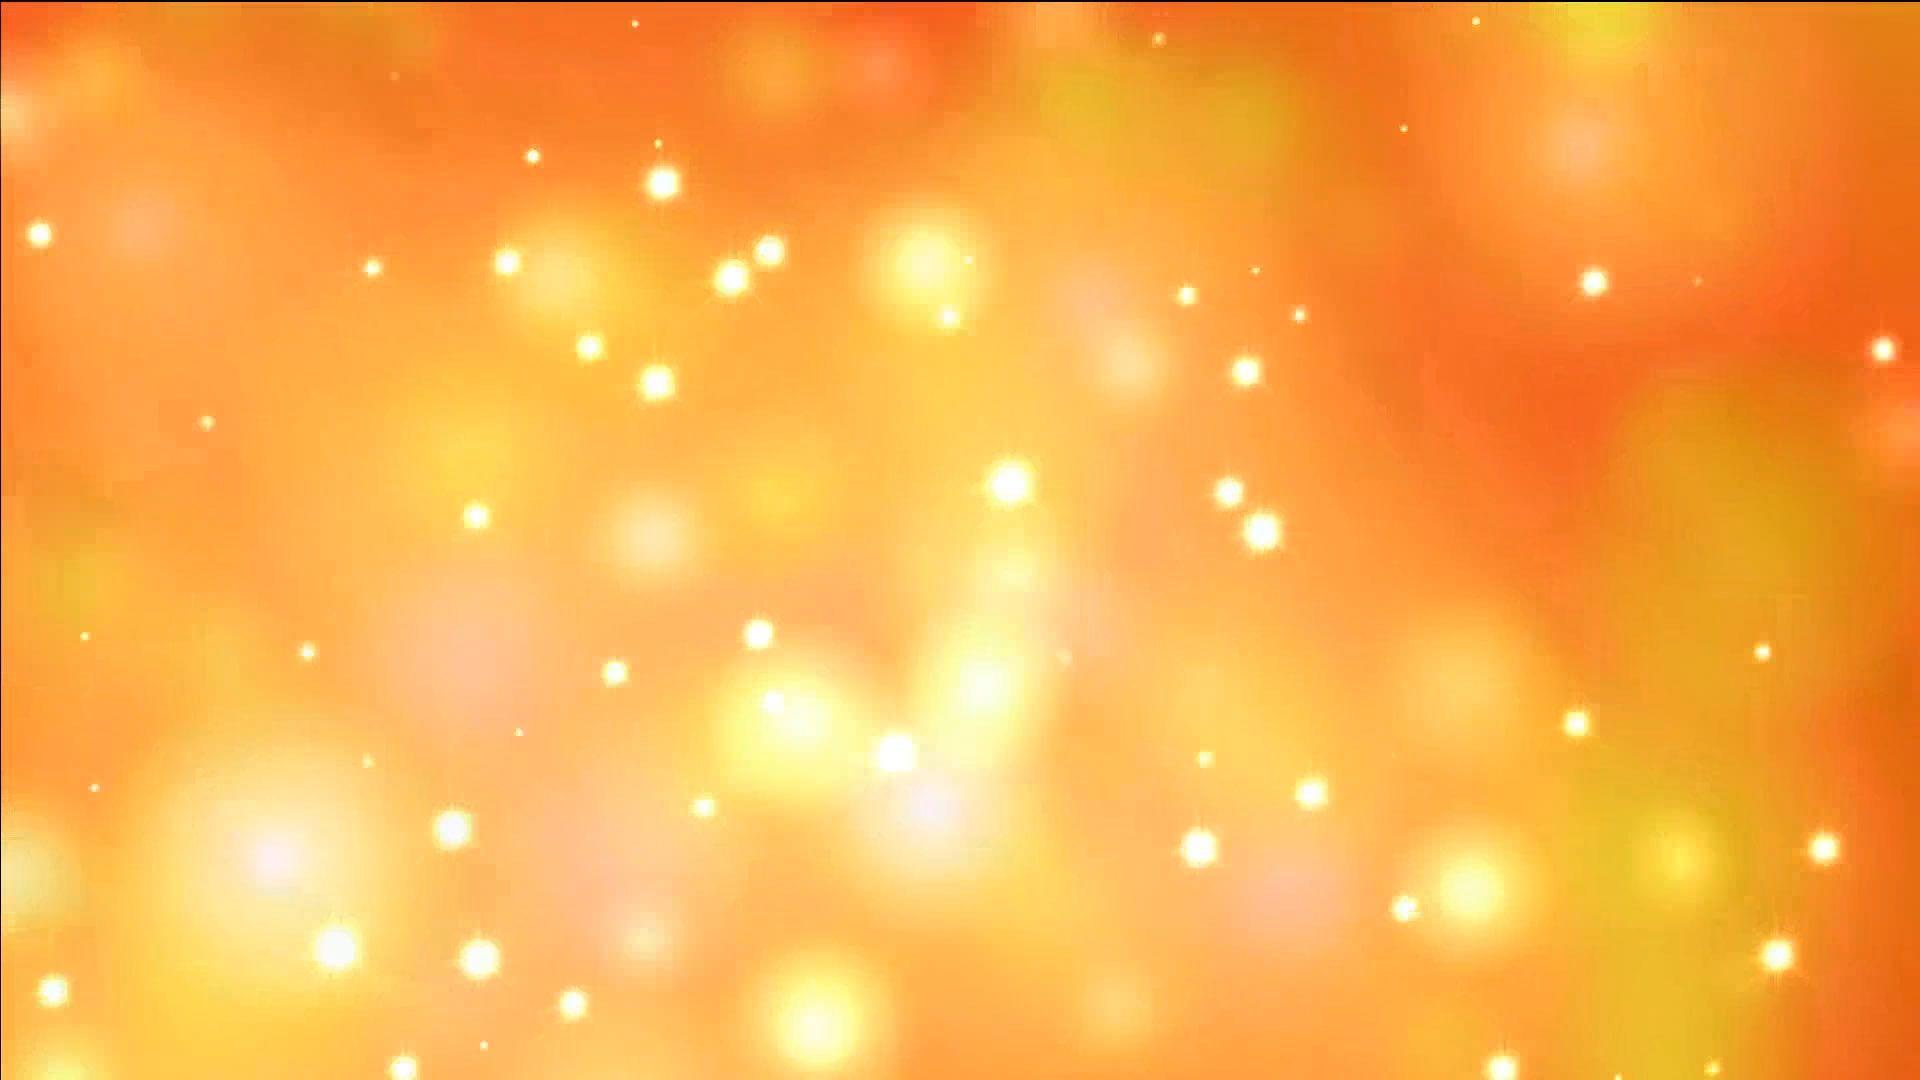 backgrounds for orange background